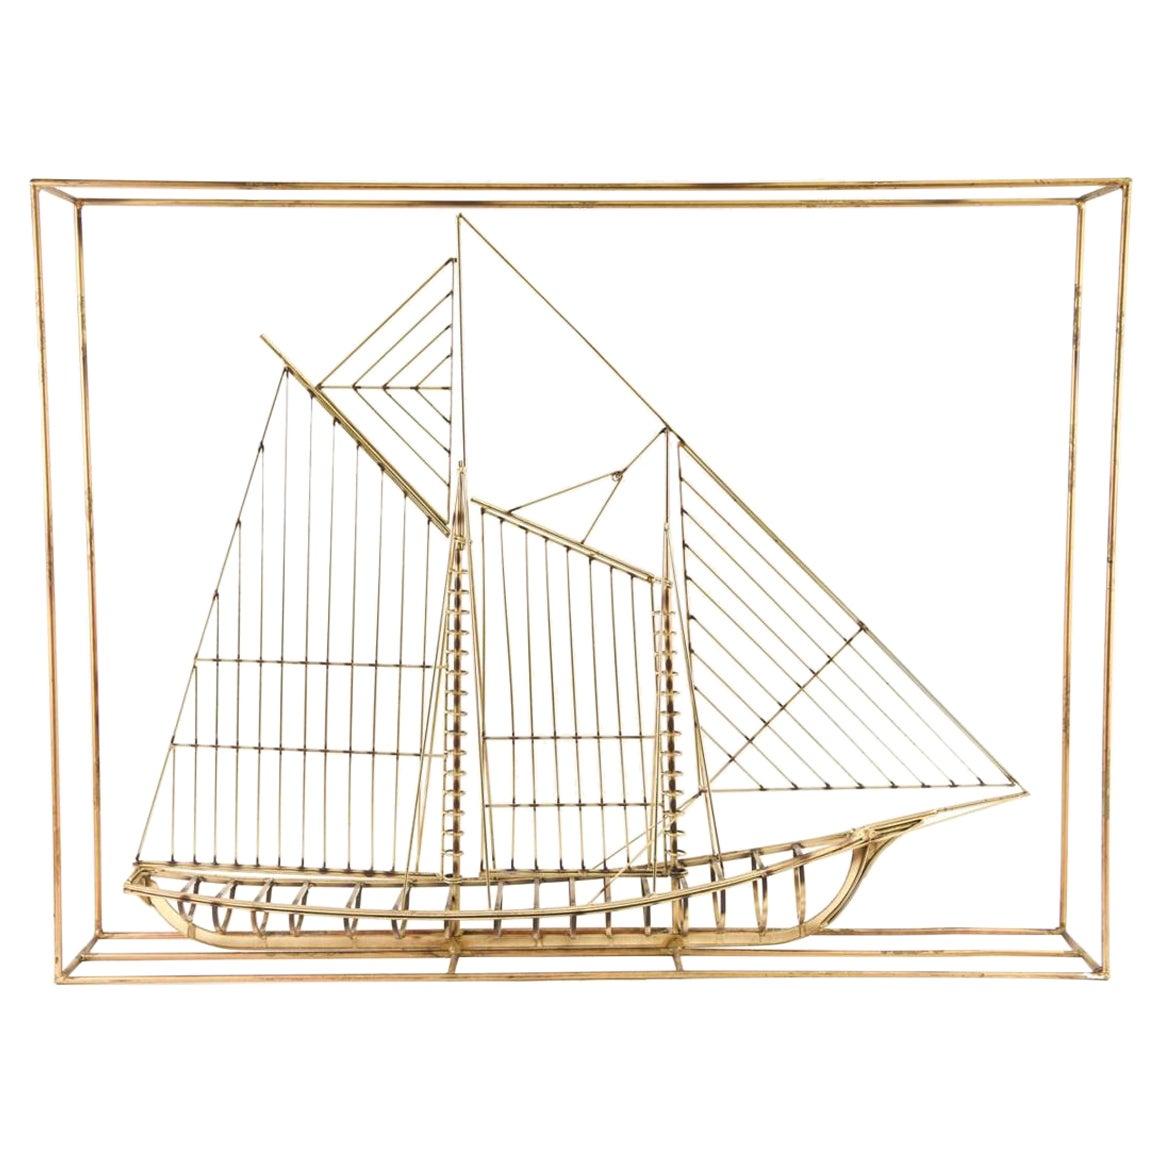 Curtis Jere Brass Ship Sculpture, Signed